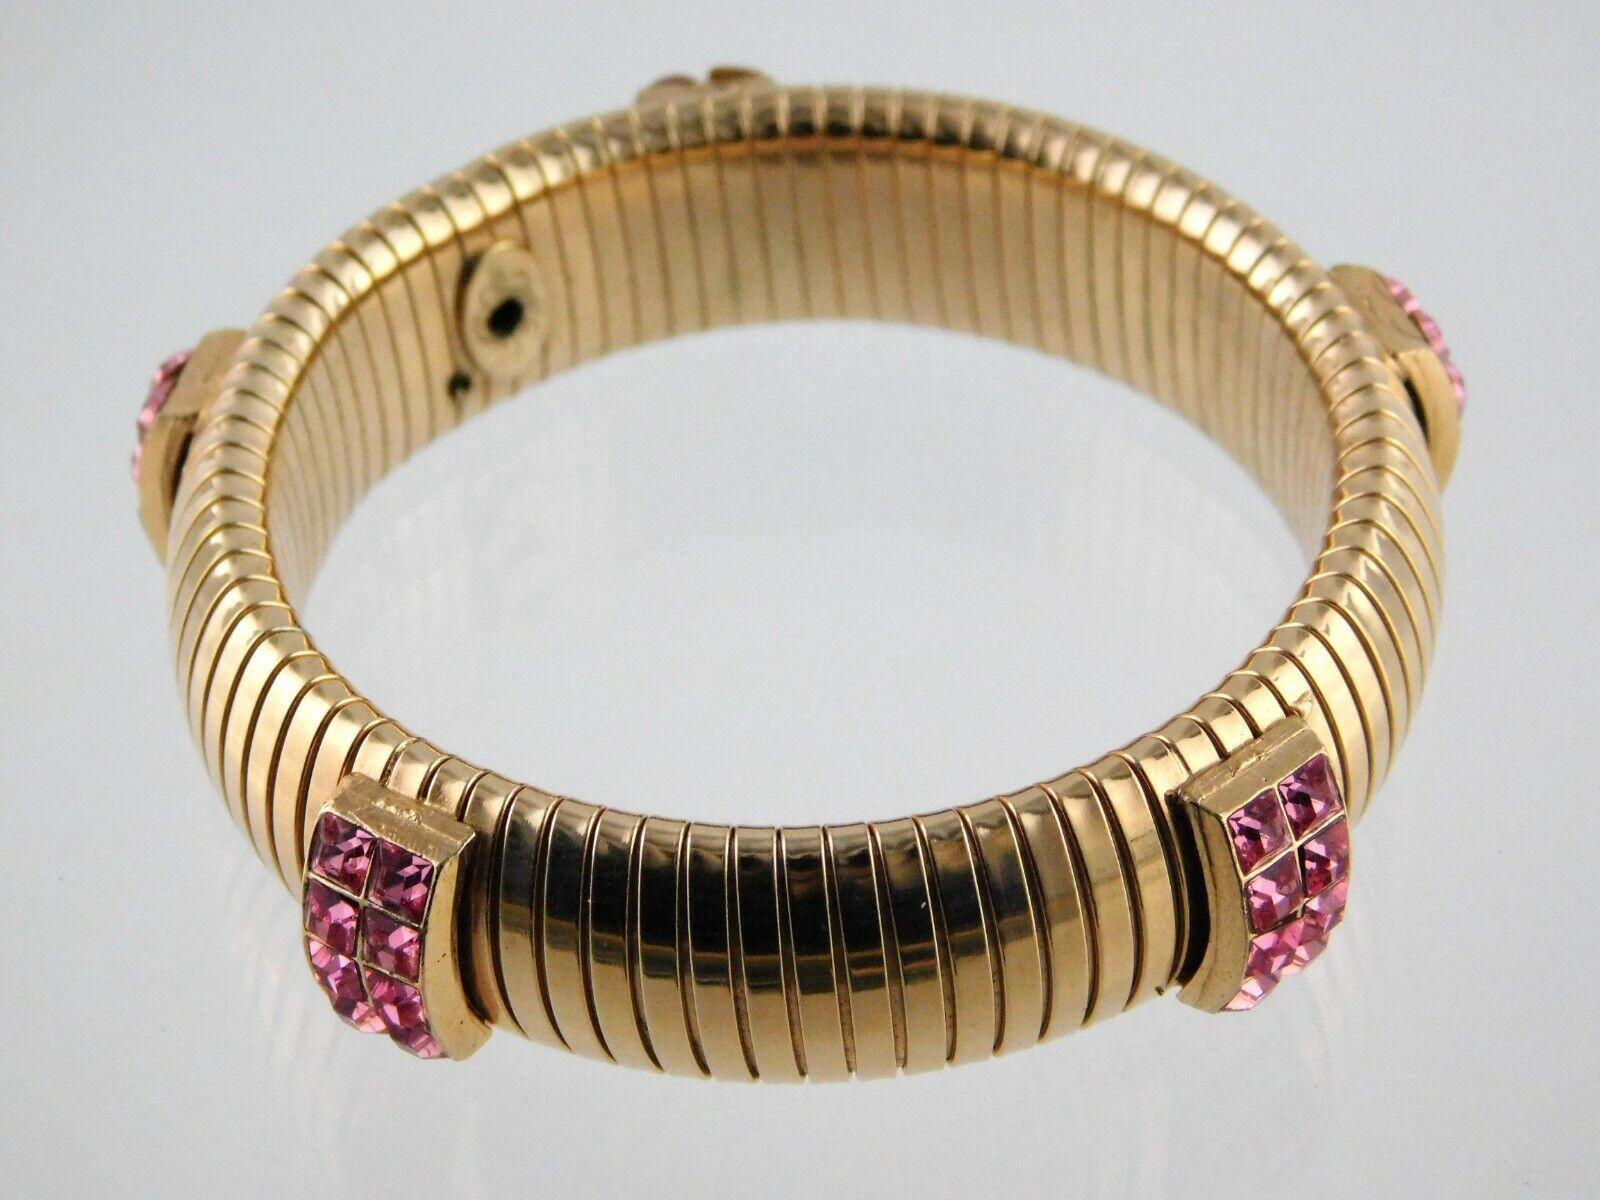 Vintage Goldtone White Gemstone Stretch  Design Bracelet 2.25/'/' Diameter